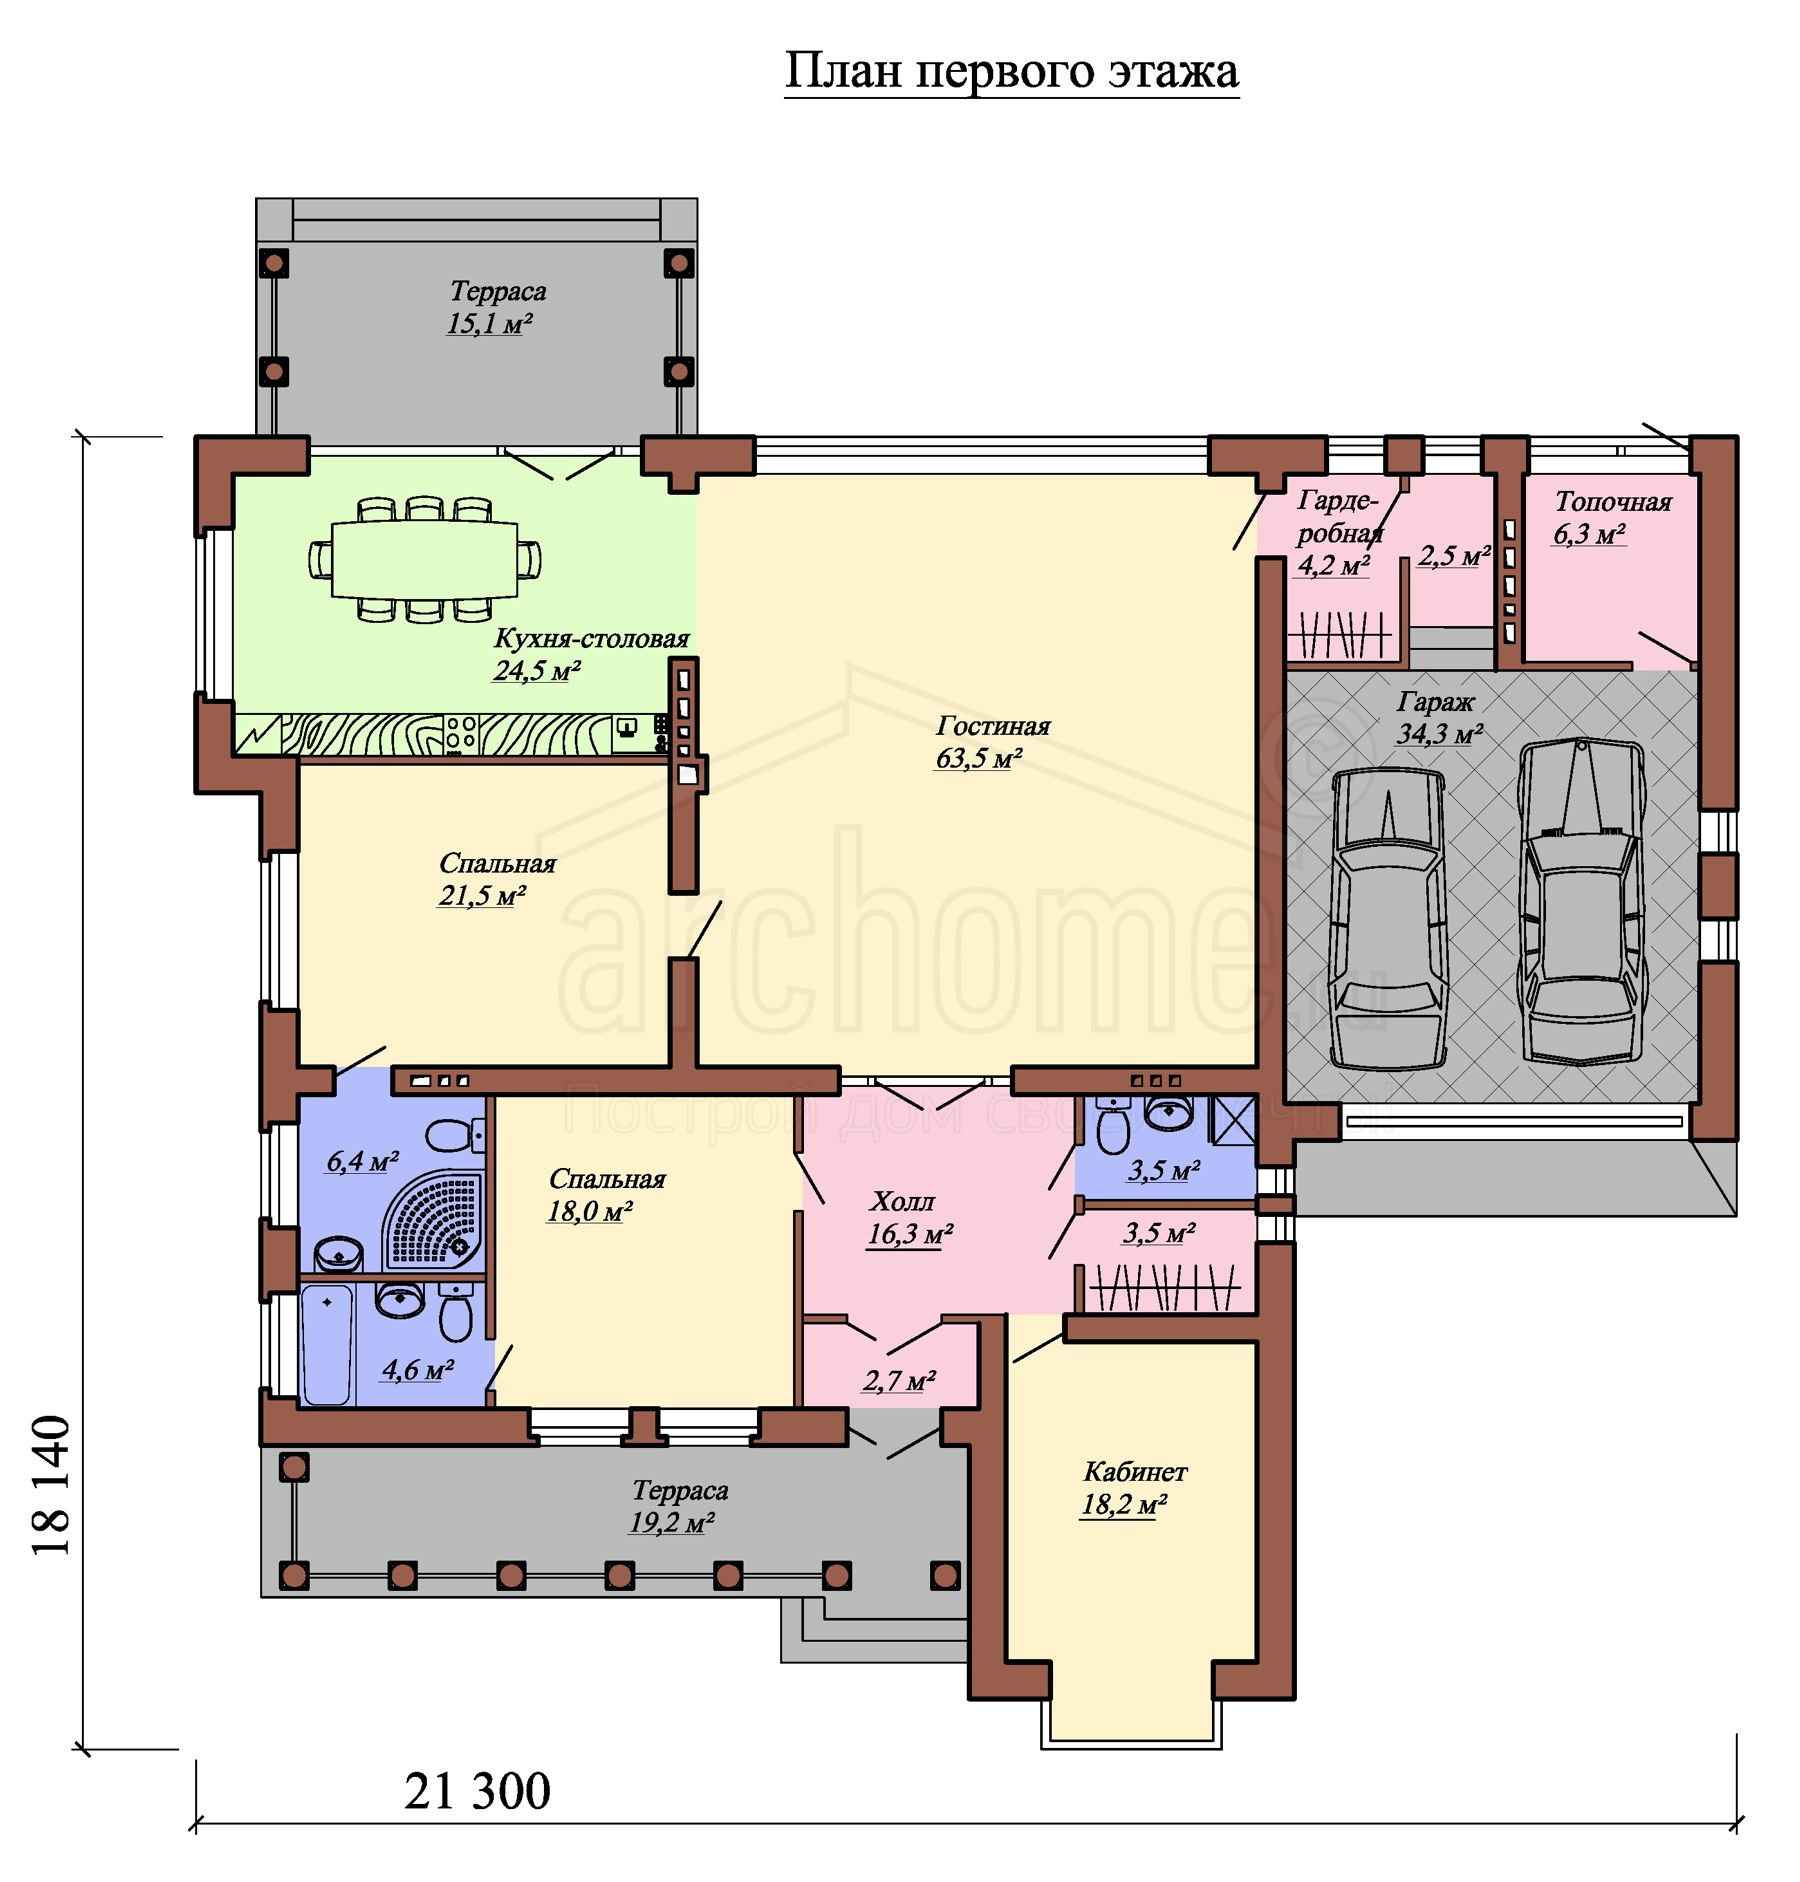 Планы этажей проекта ВИНСЕНТ 1